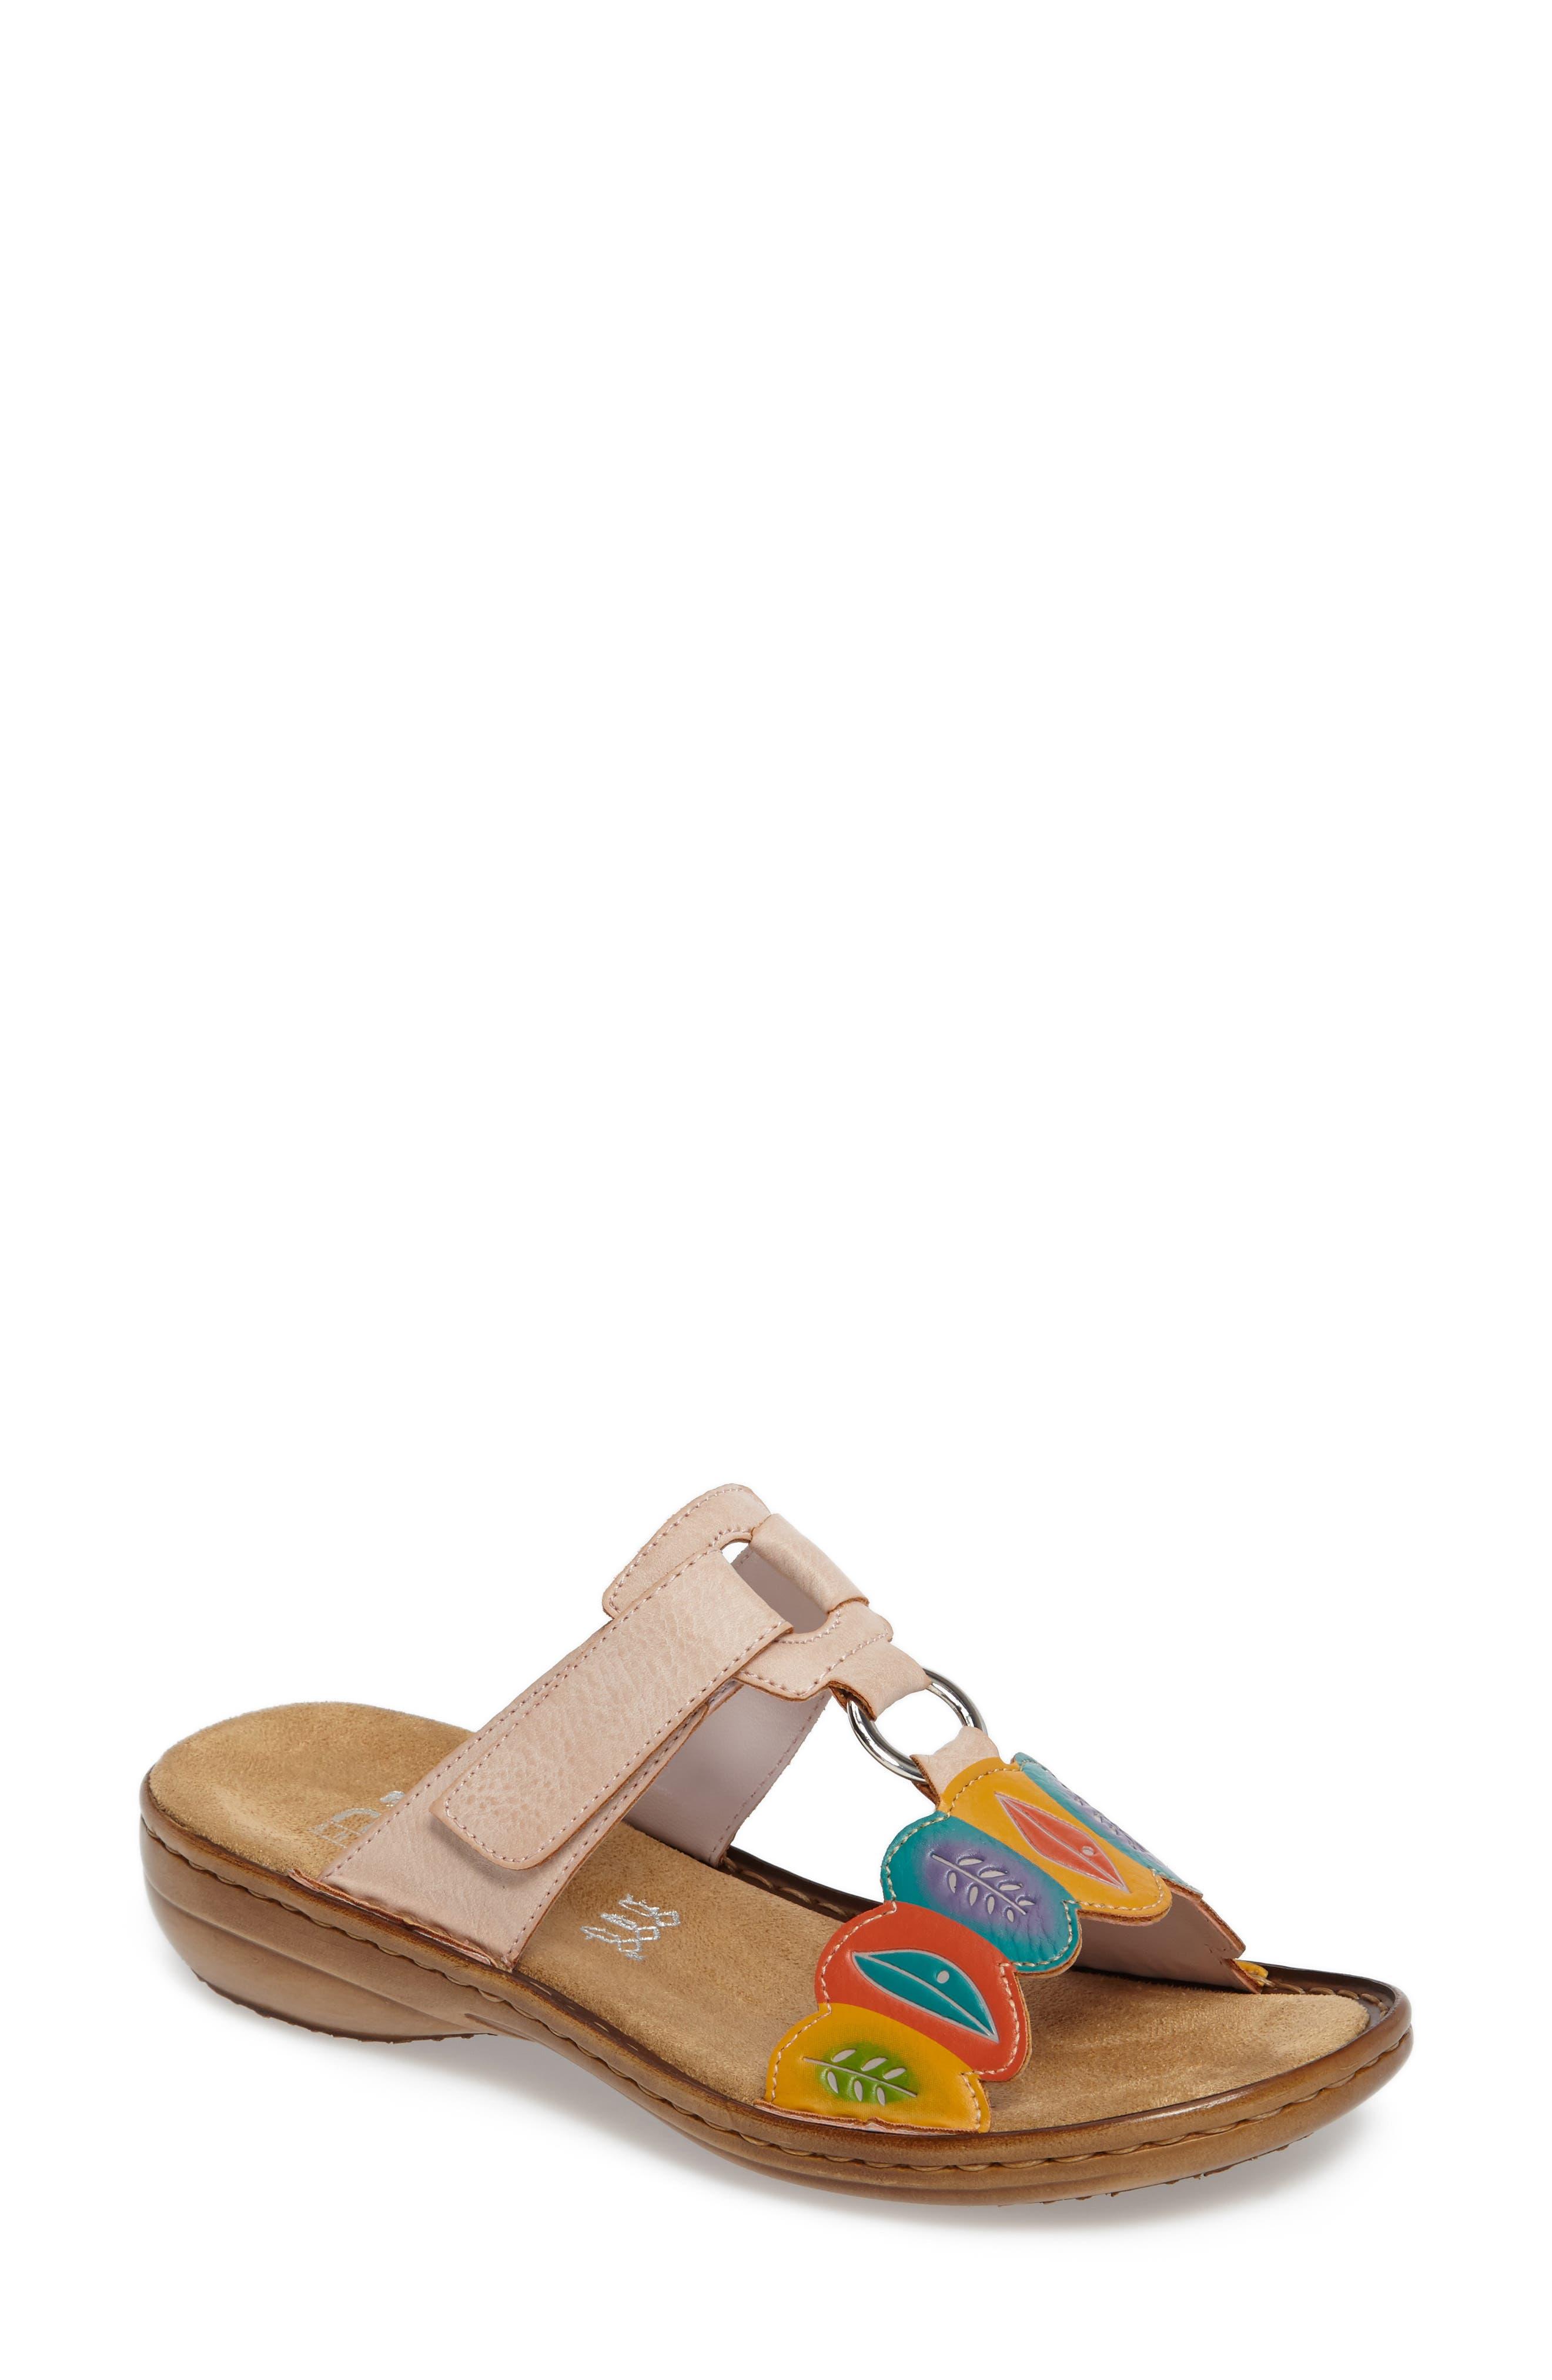 Main Image - Rieker Antistress Regina R4 Slide Sandal (Women)